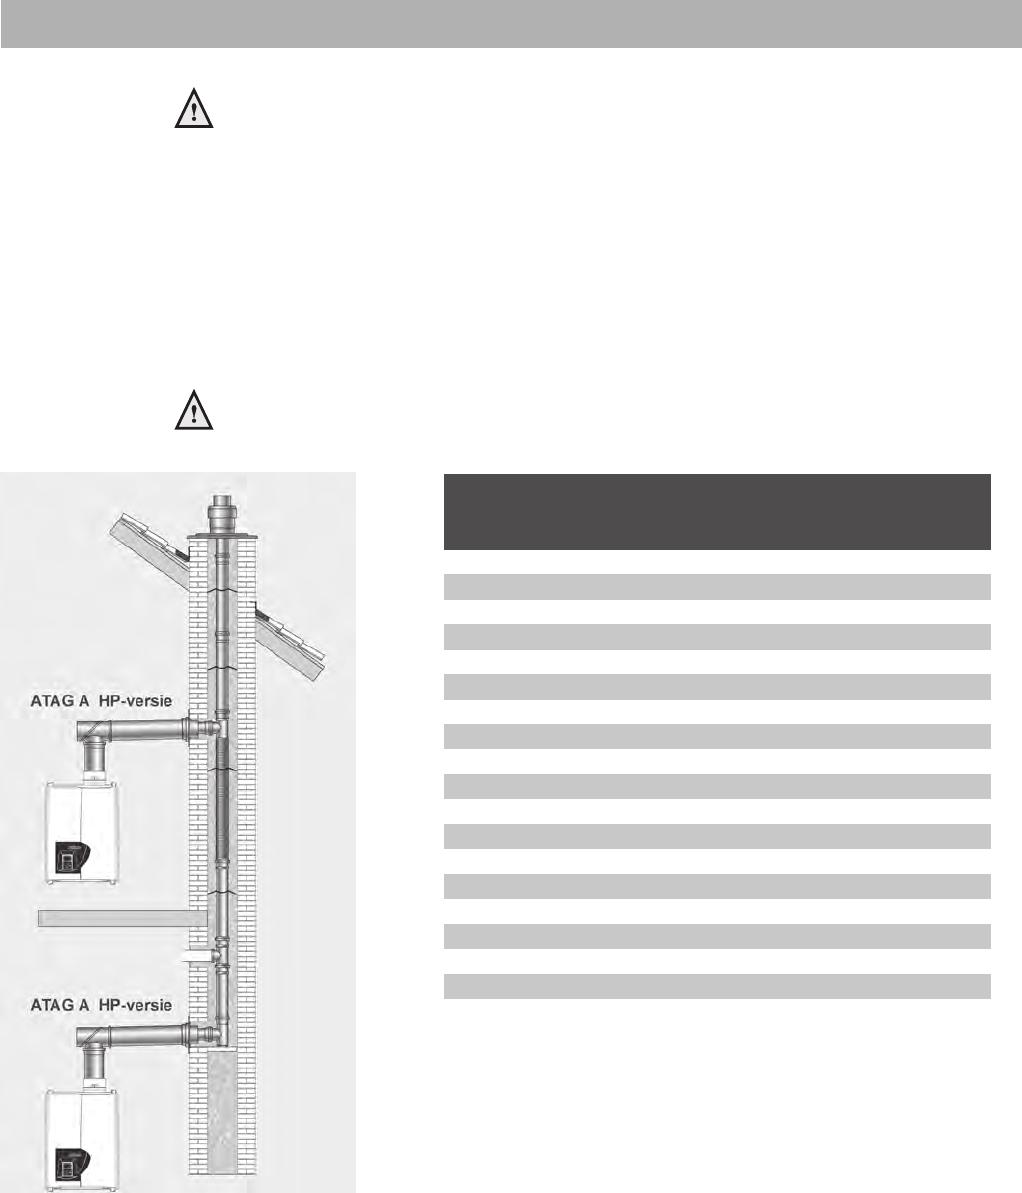 Voorkeur Handleiding ATAG A244EC-CW4 (pagina 19 van 36) (Nederlands) TF05